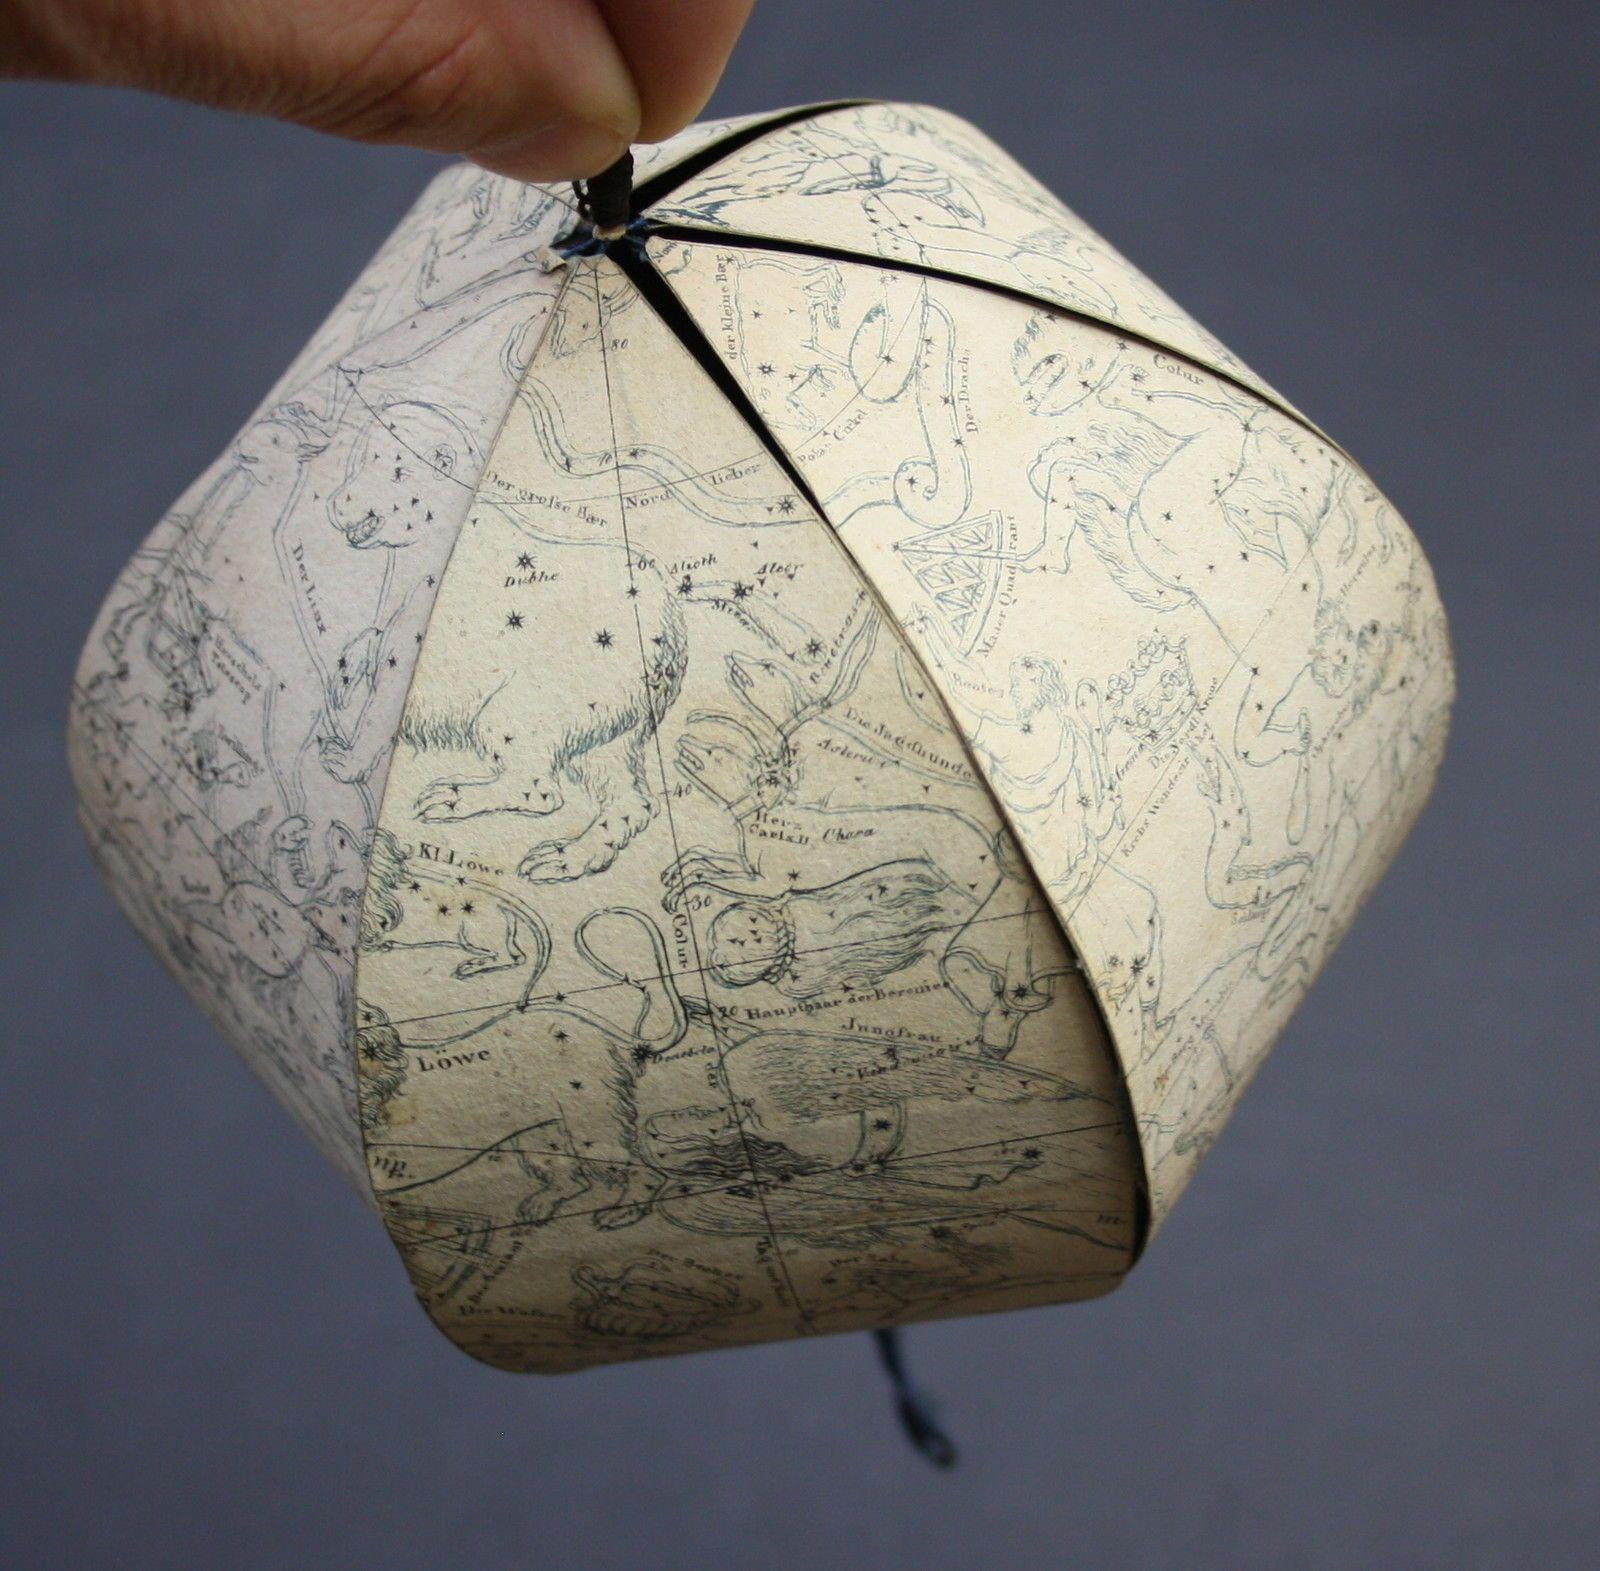 1824 celestial folding globe friedrich g schulz stuttgart world map 1824 celestial folding globe friedrich g schulz stuttgart world map globus ebay gumiabroncs Gallery